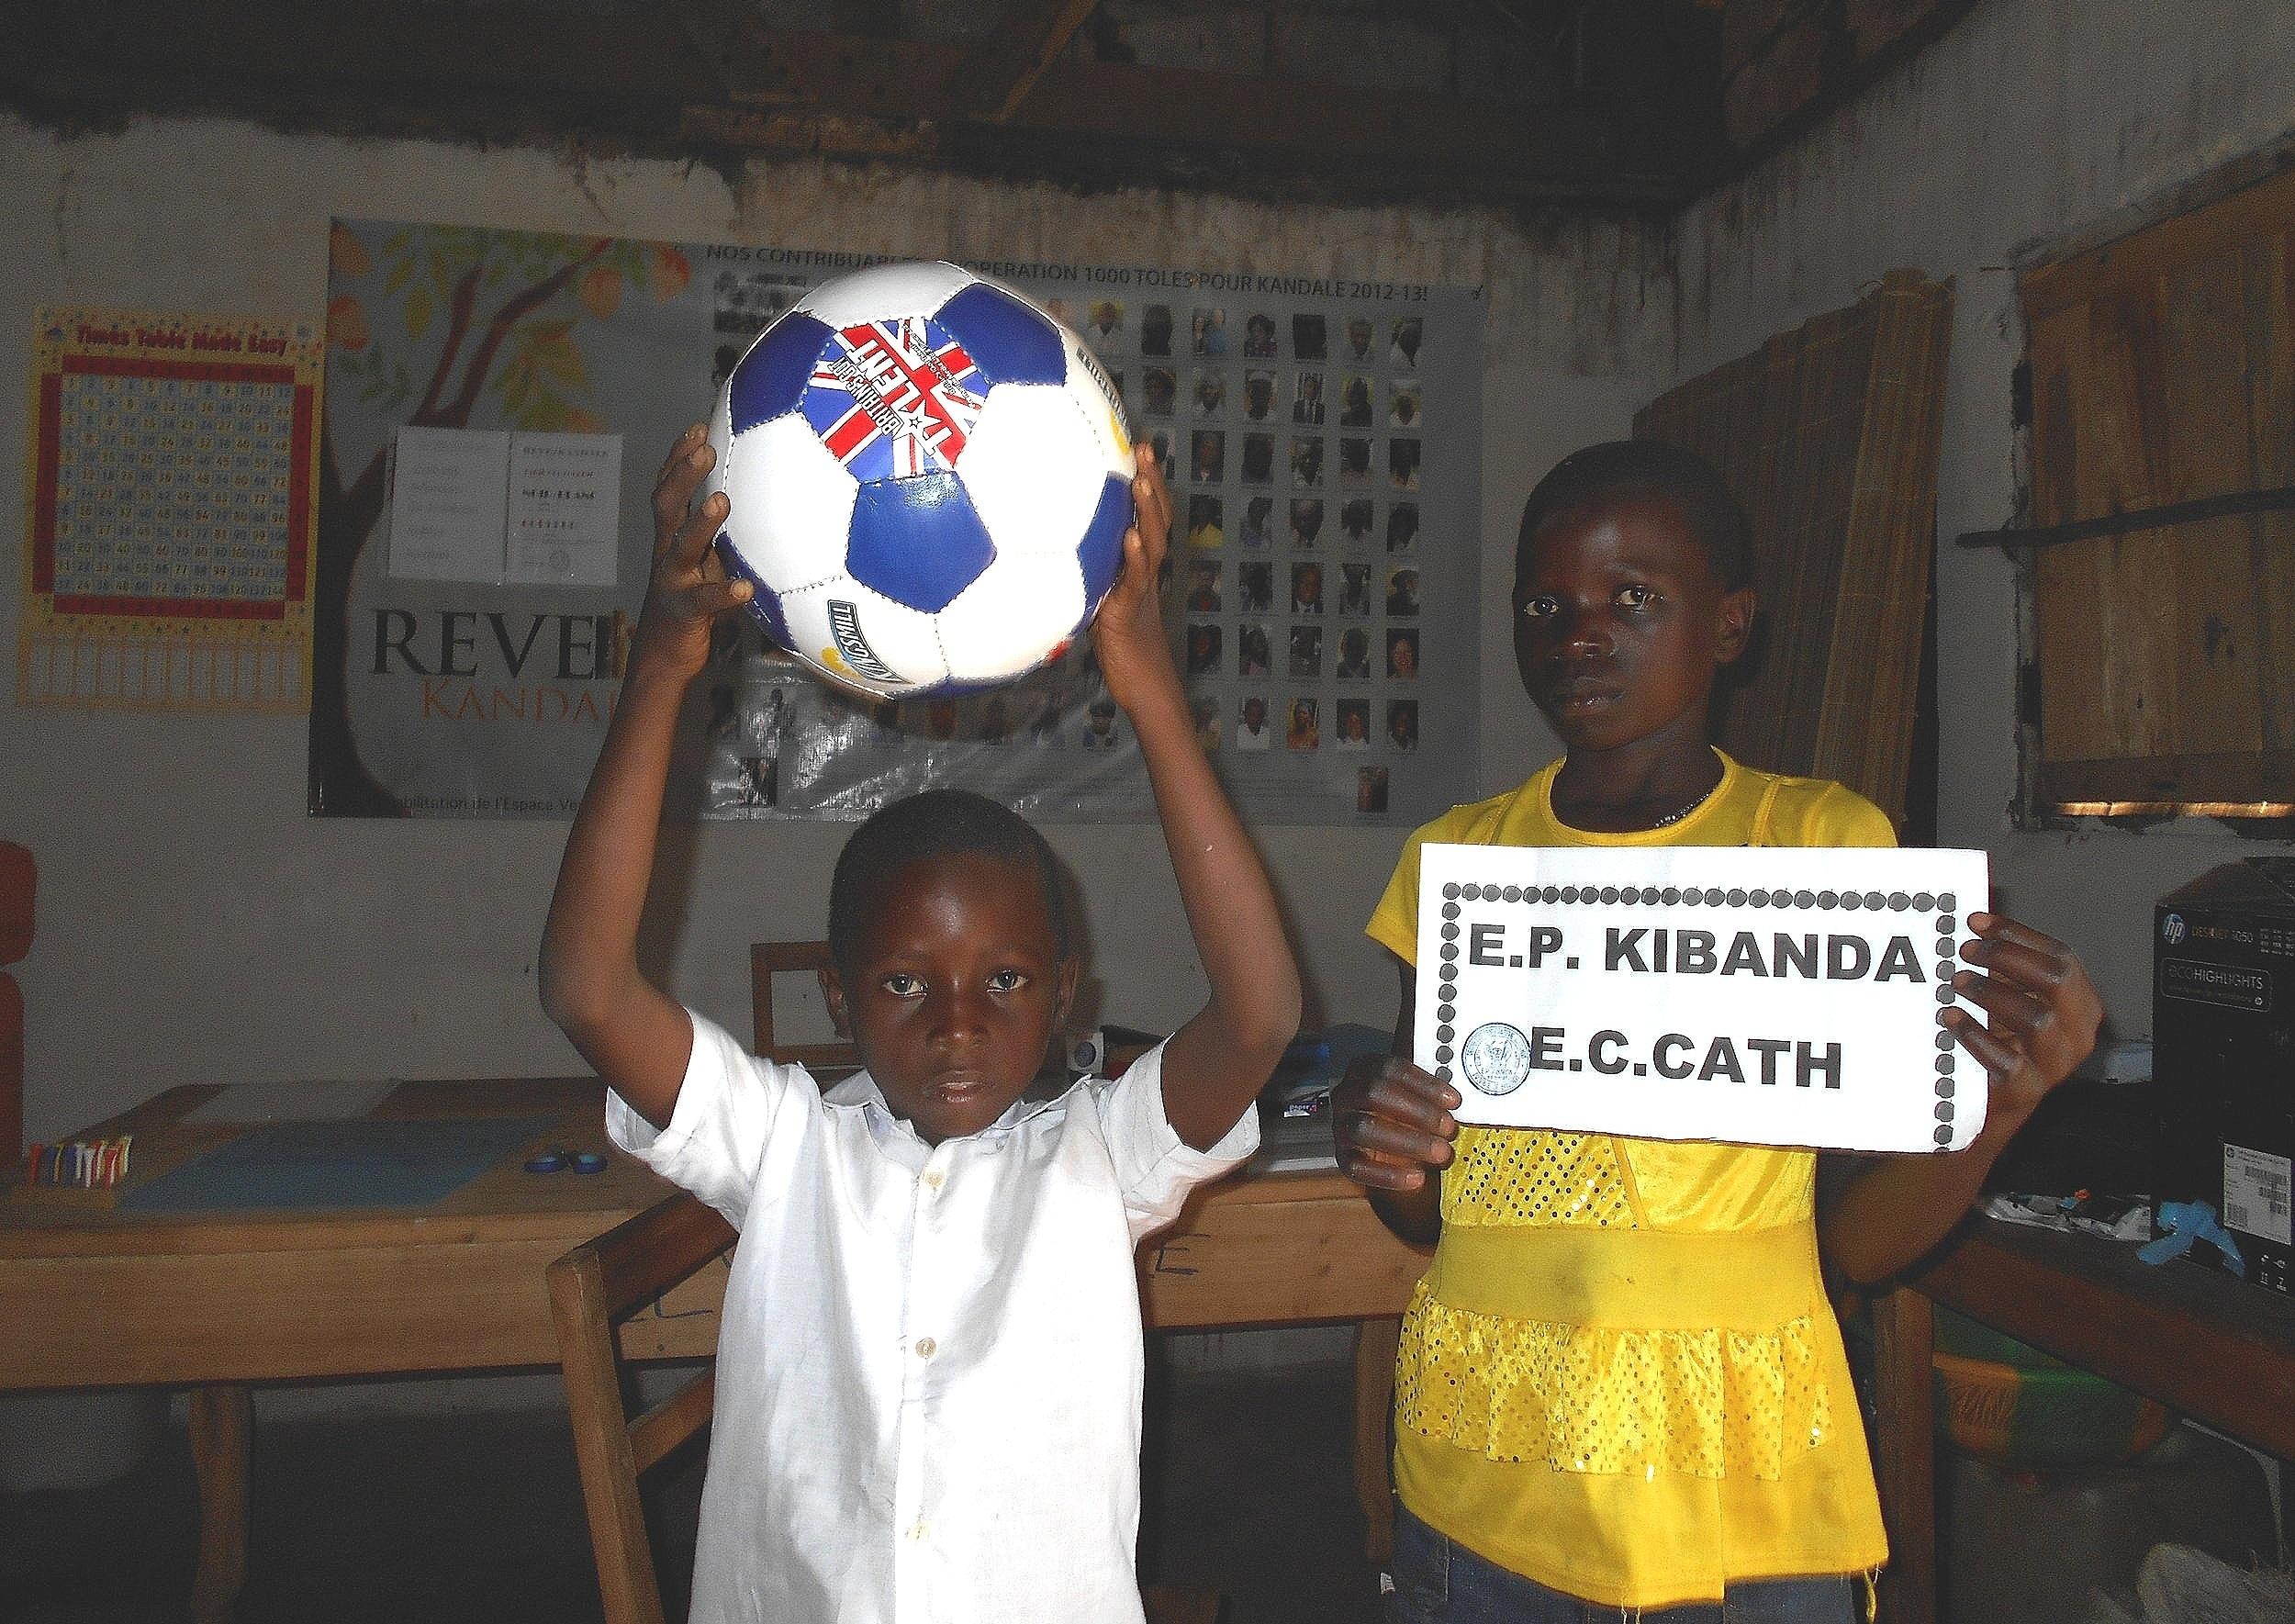 Kibanda Village Catholic Primary School - 205 Students (102 girls, 103 boys)7 Classes and 8 Staff (2 Women)